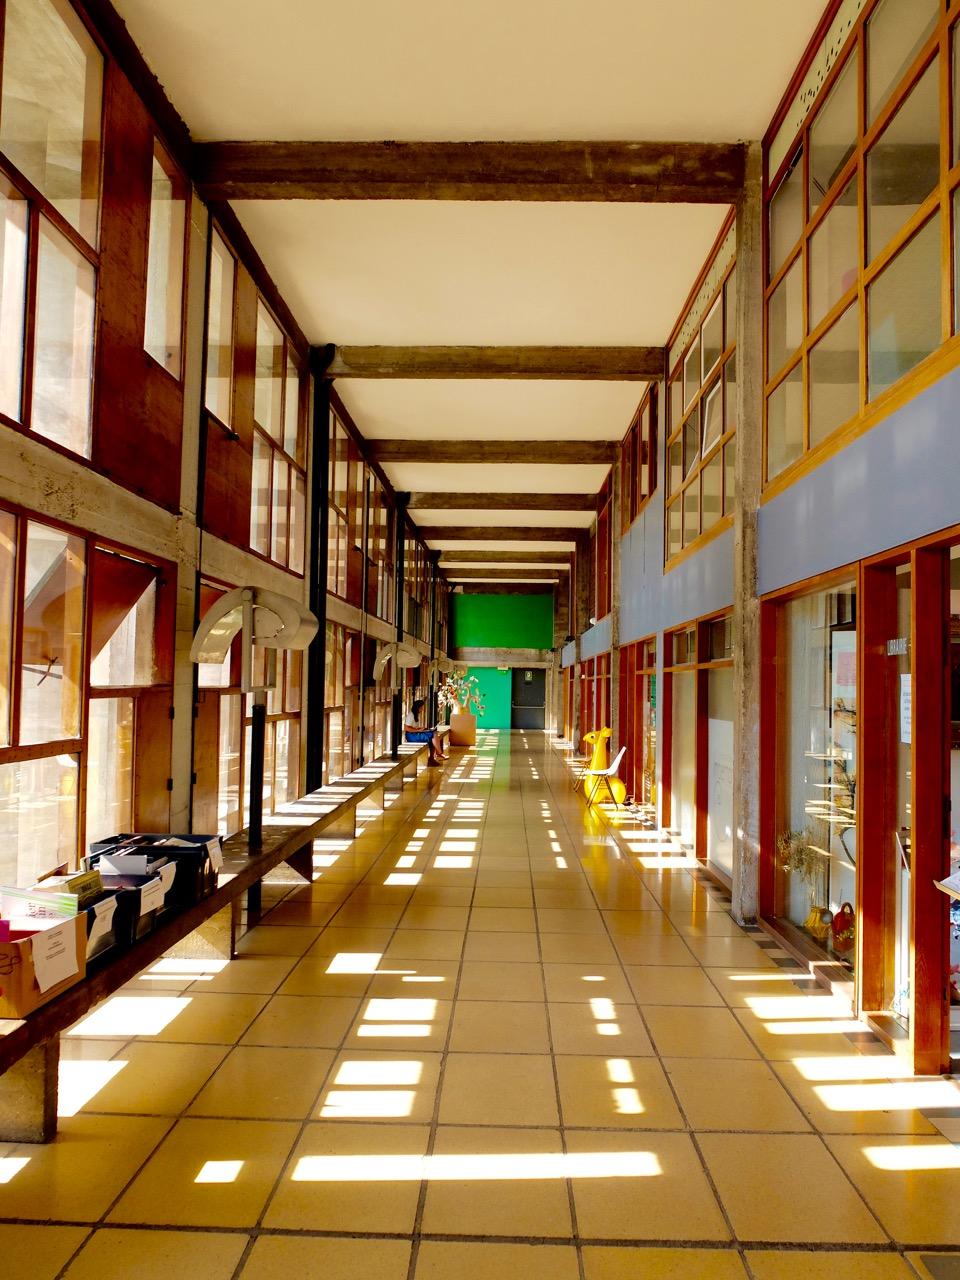 marseille-architecture-cite-radieuse-corbusier-hallway